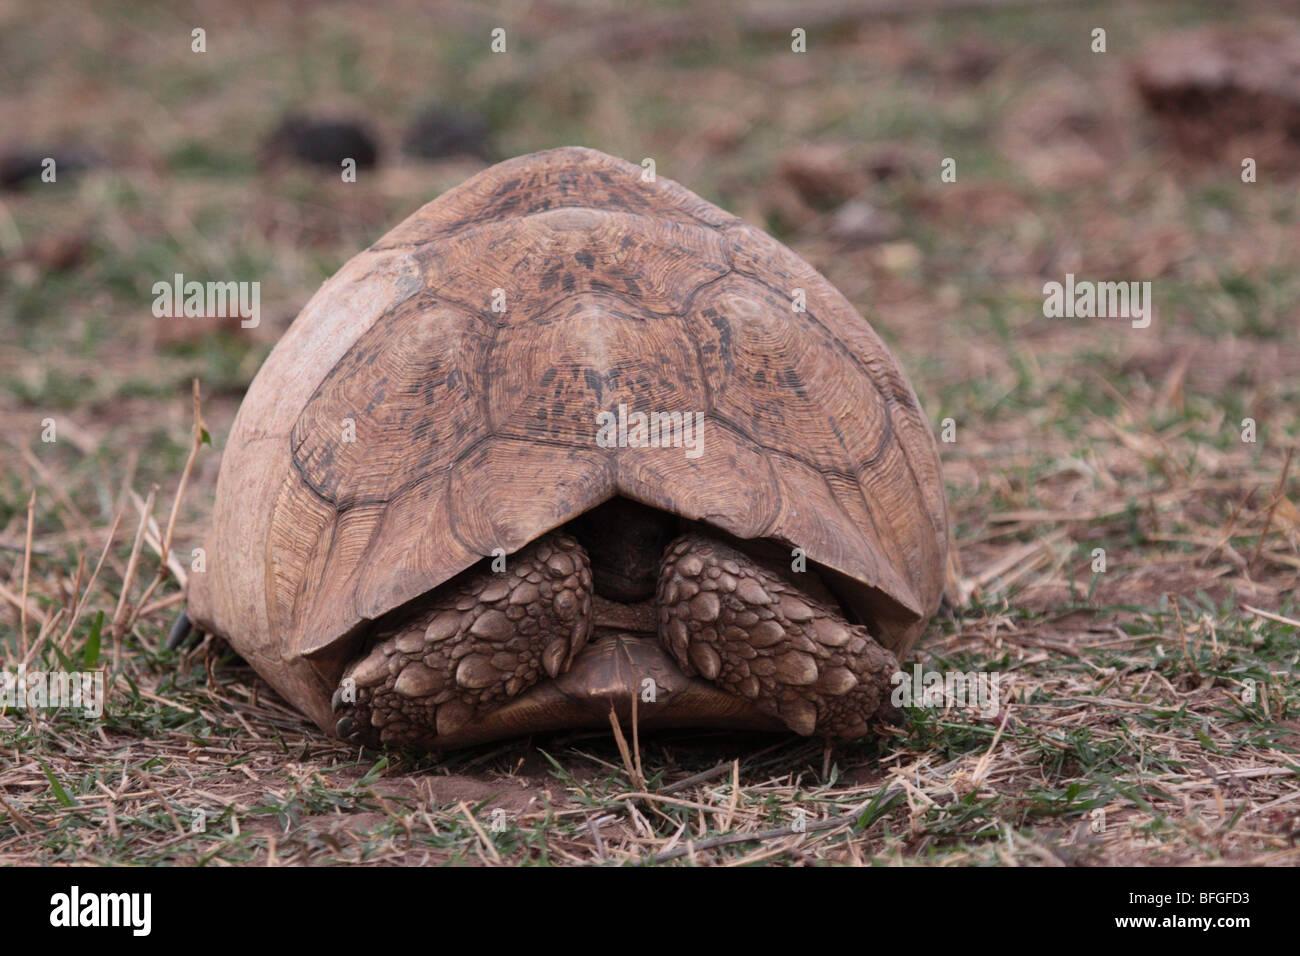 Leopard tortoise hiding - Stock Image